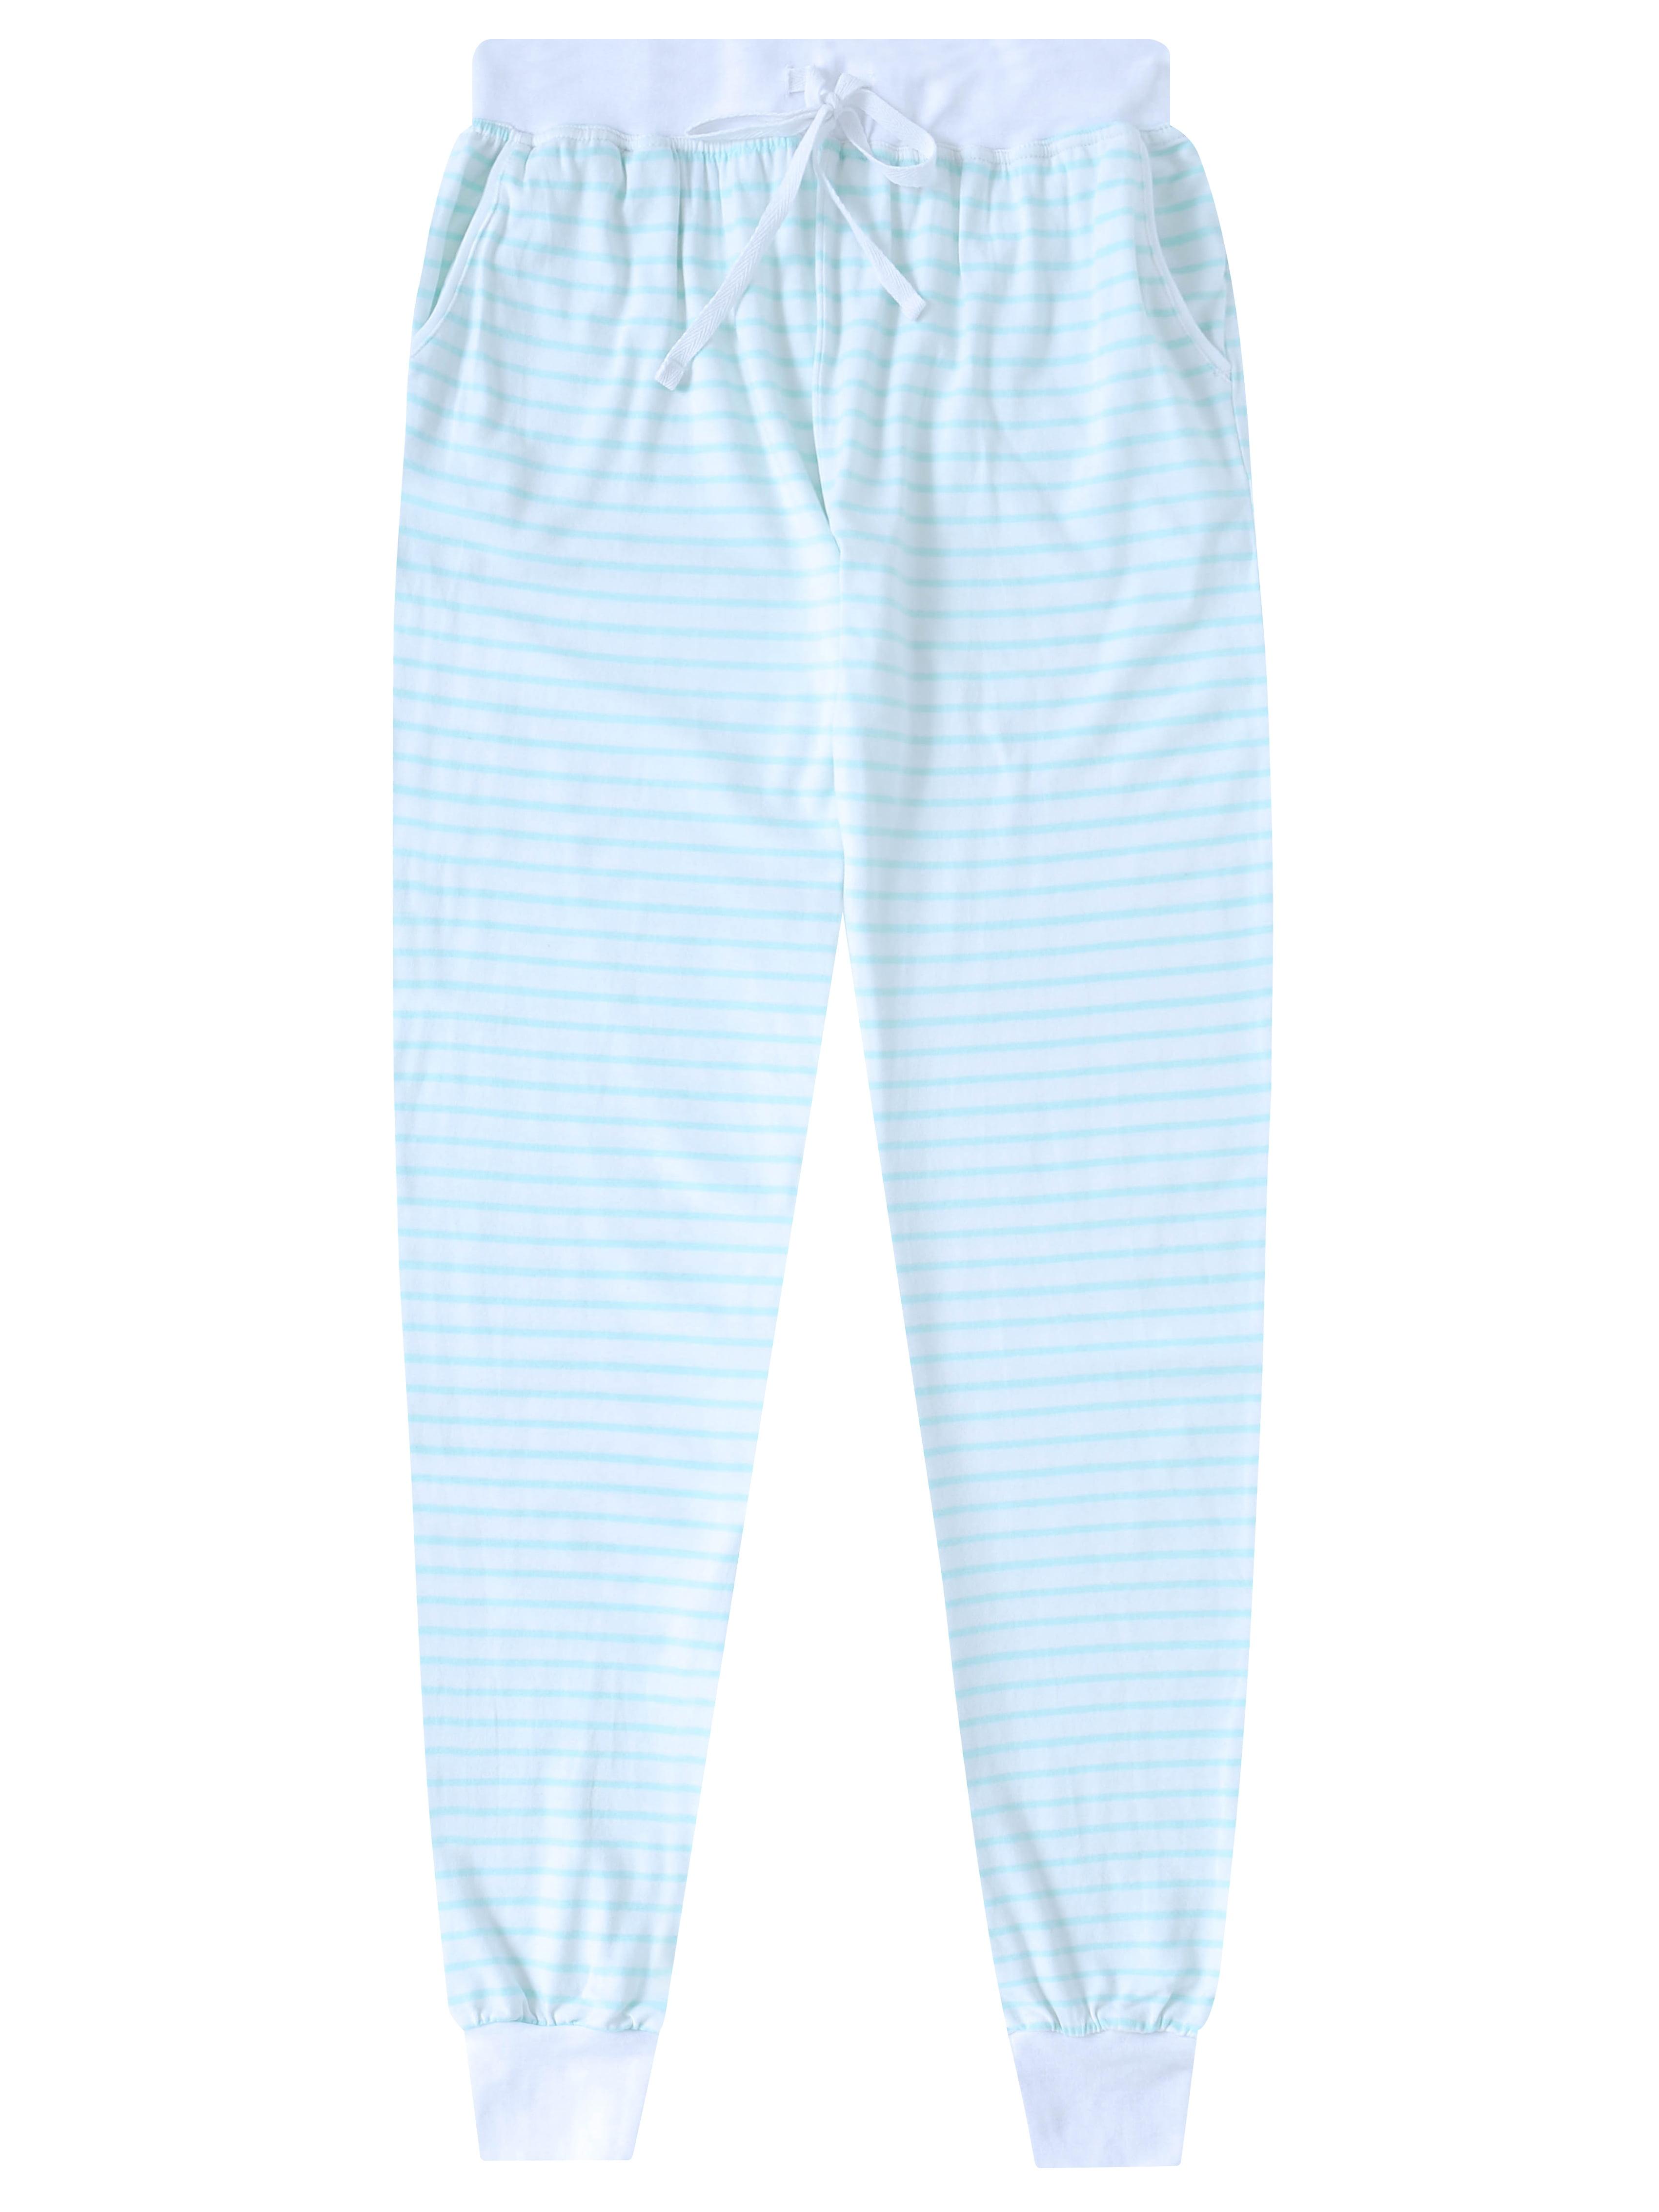 Donna L/'oren Women/'s Olive Jogger Pajama Sleep Lounge Pants